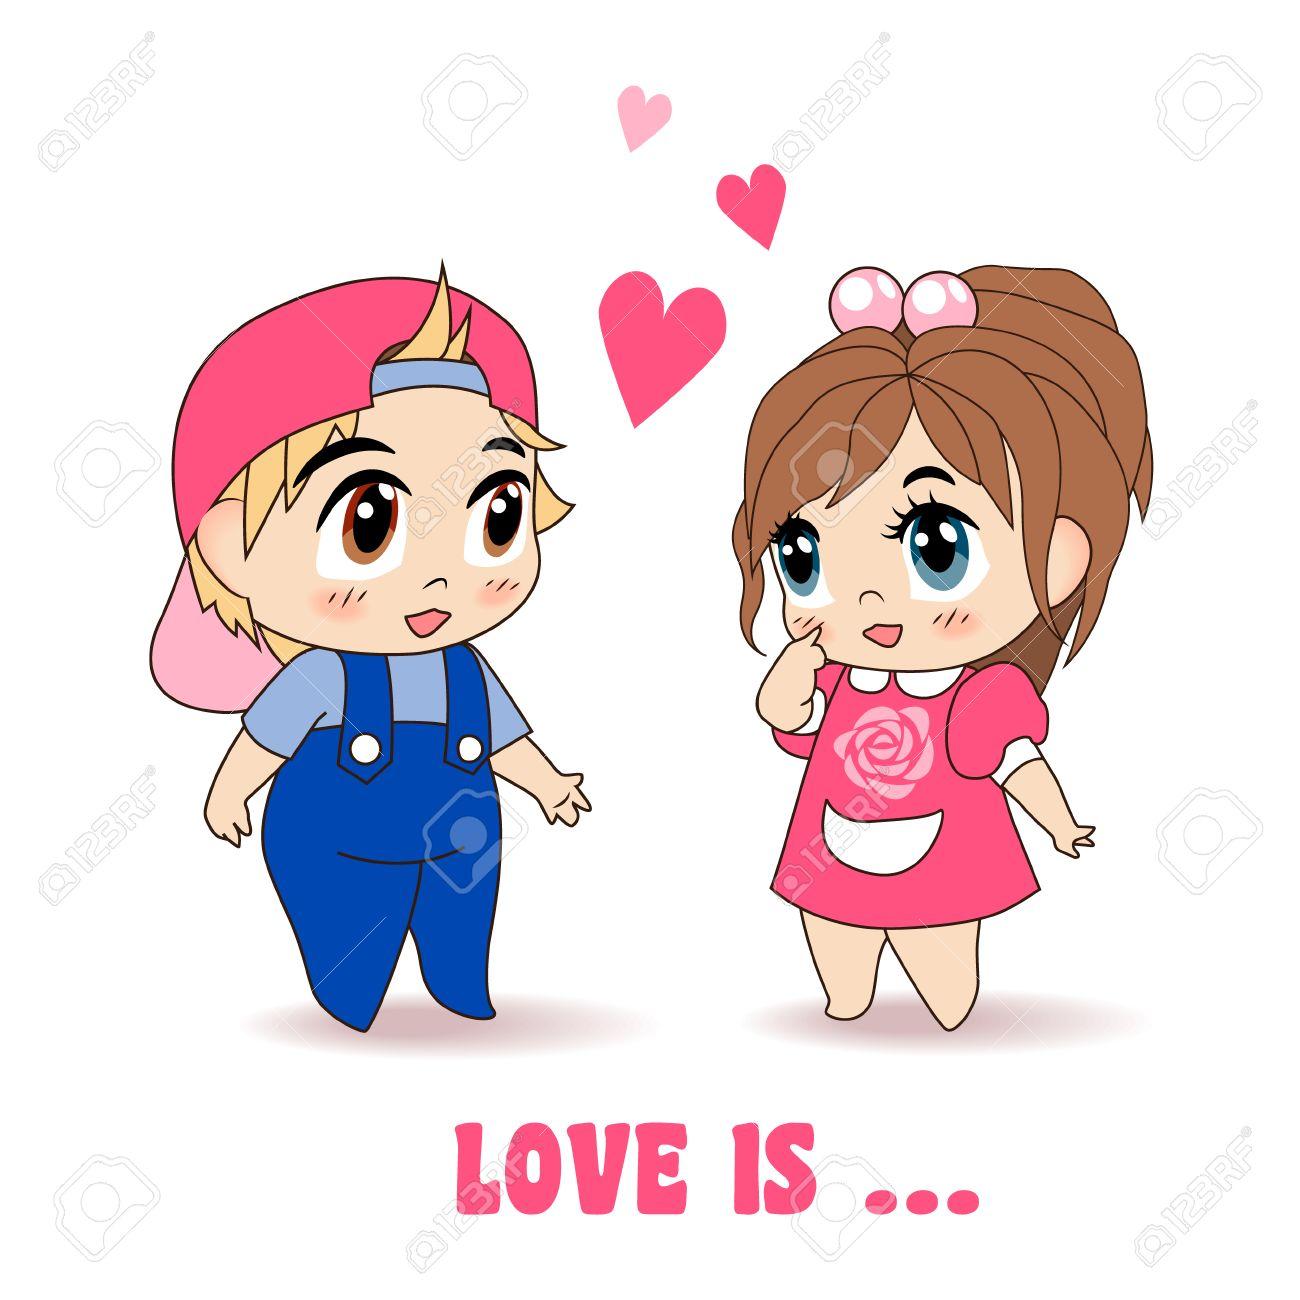 Little Boy And Girl Romantic Love, Vector Illustration.